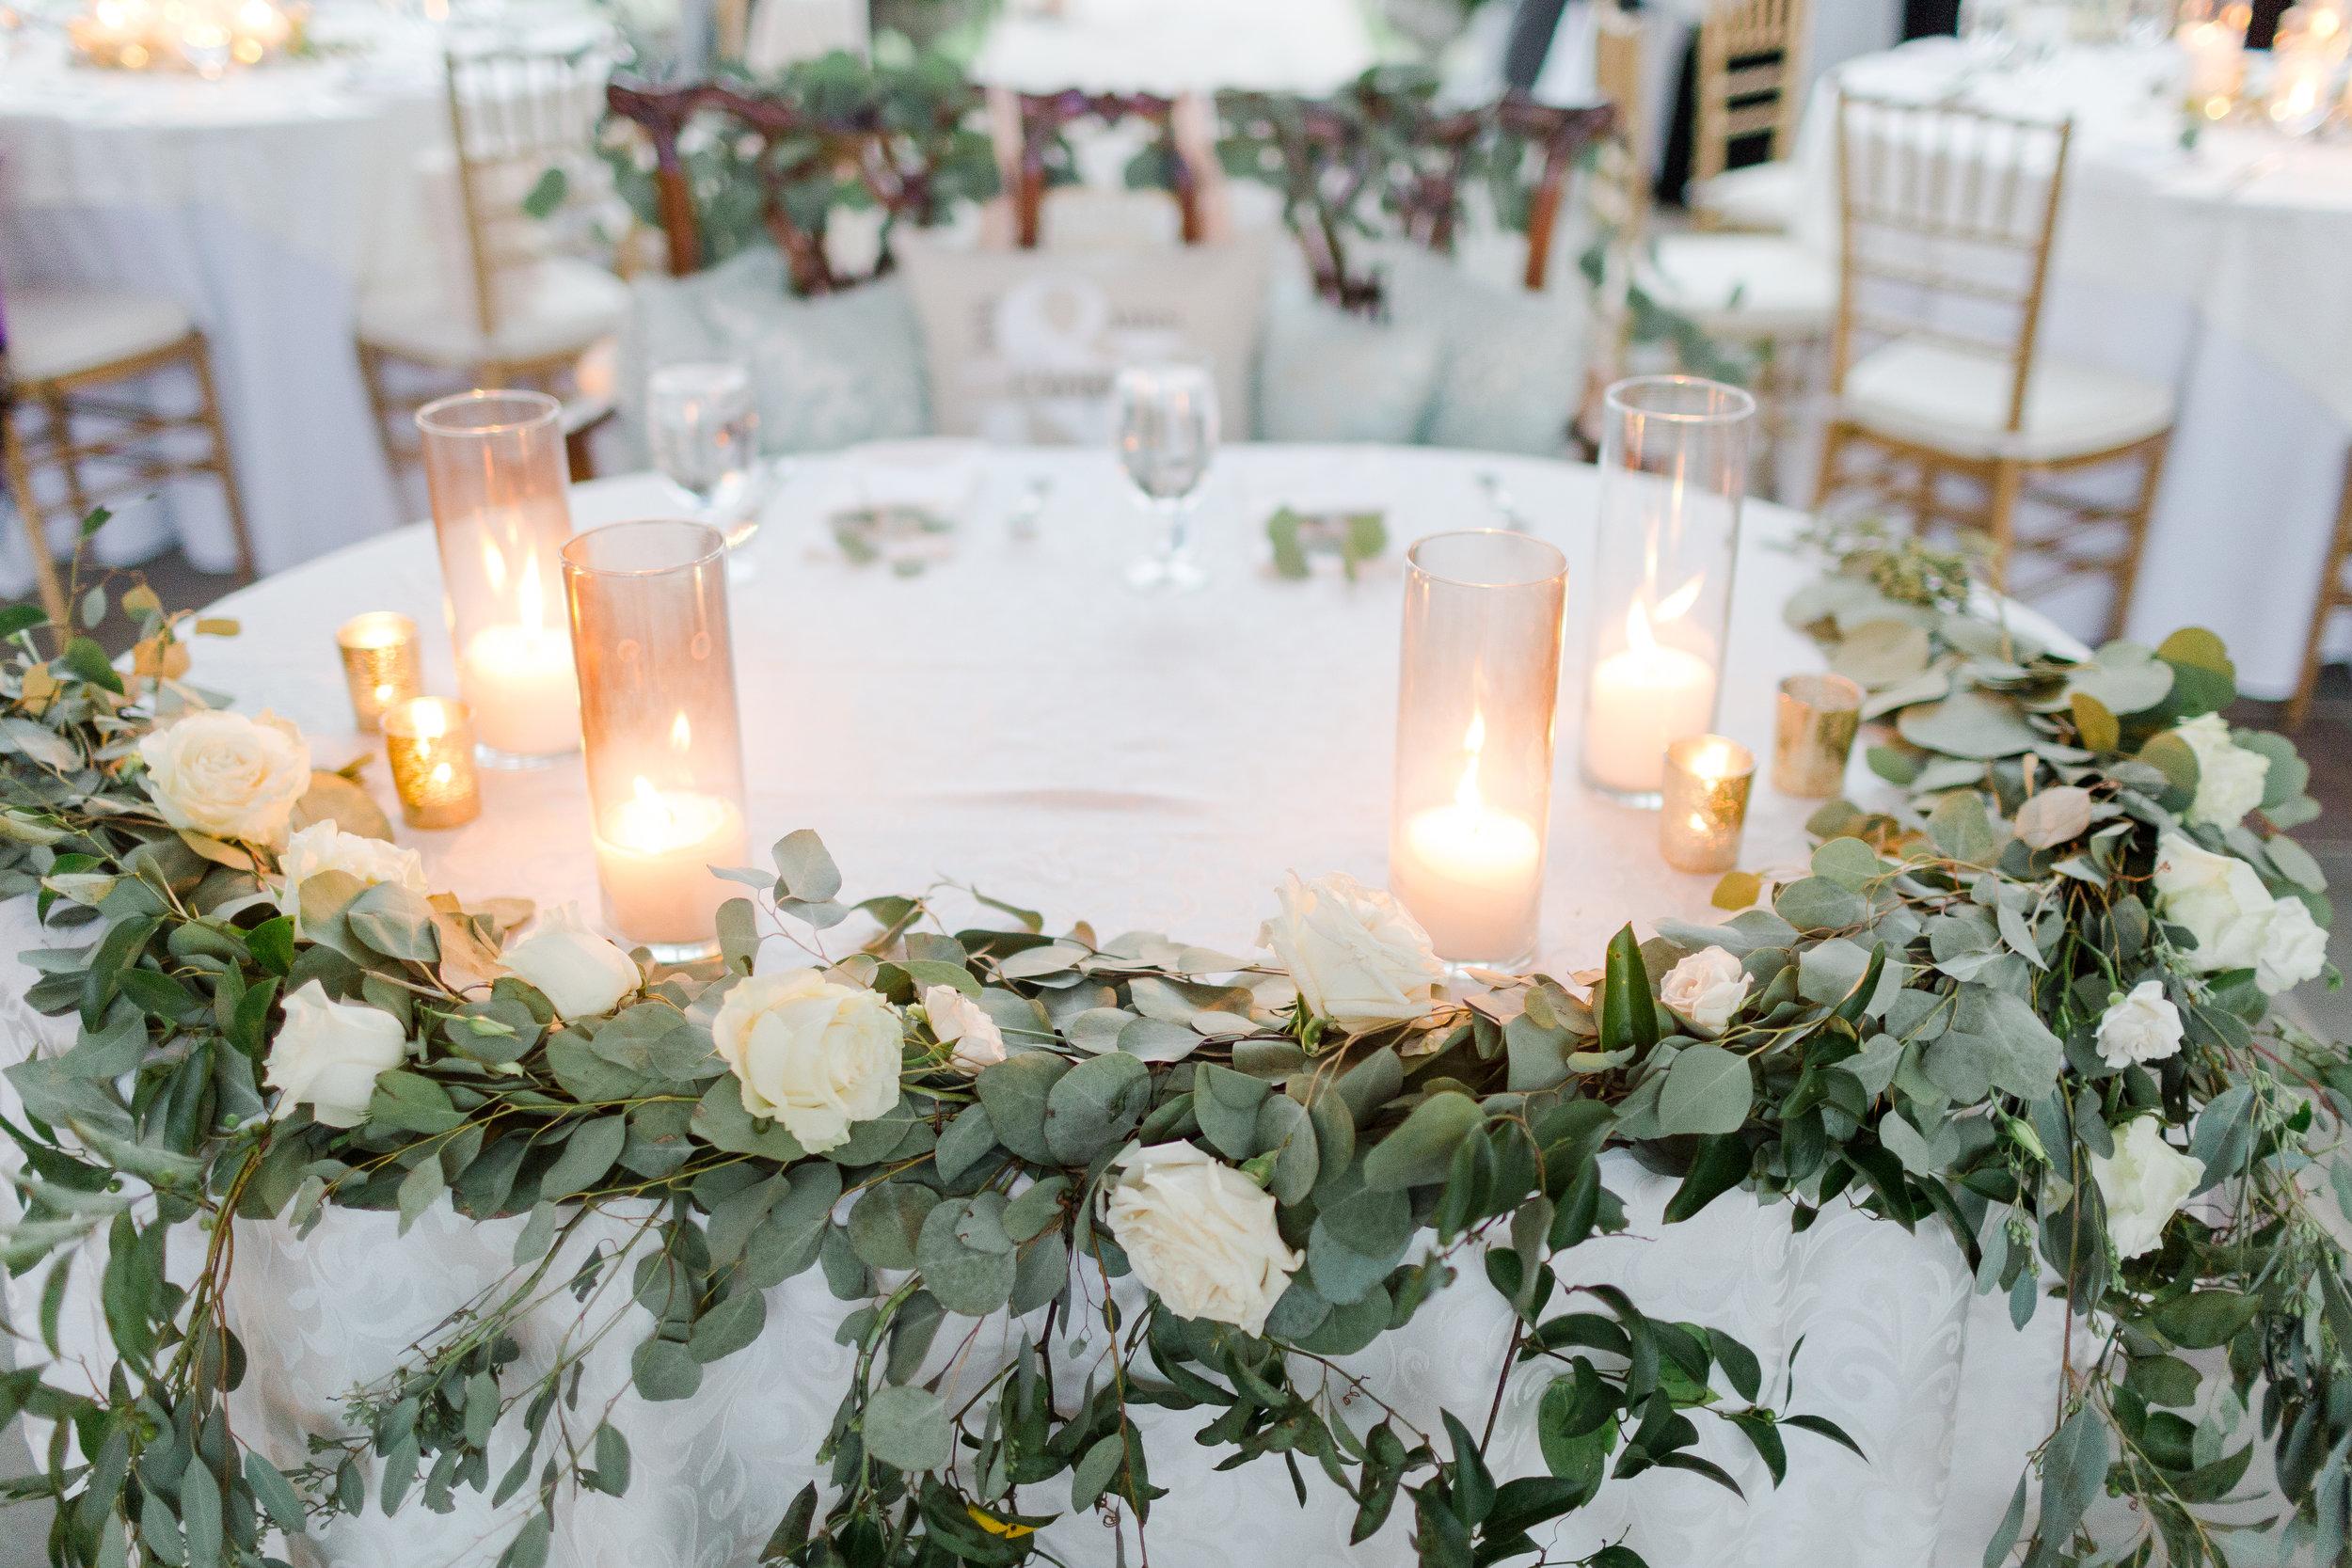 Courtney Inghram Hampton Roads Virginia Inn at Warner Hall Wedding FloristCourtney Inghram Hampton Roads Virginia Inn at Warner Hall Wedding Florist